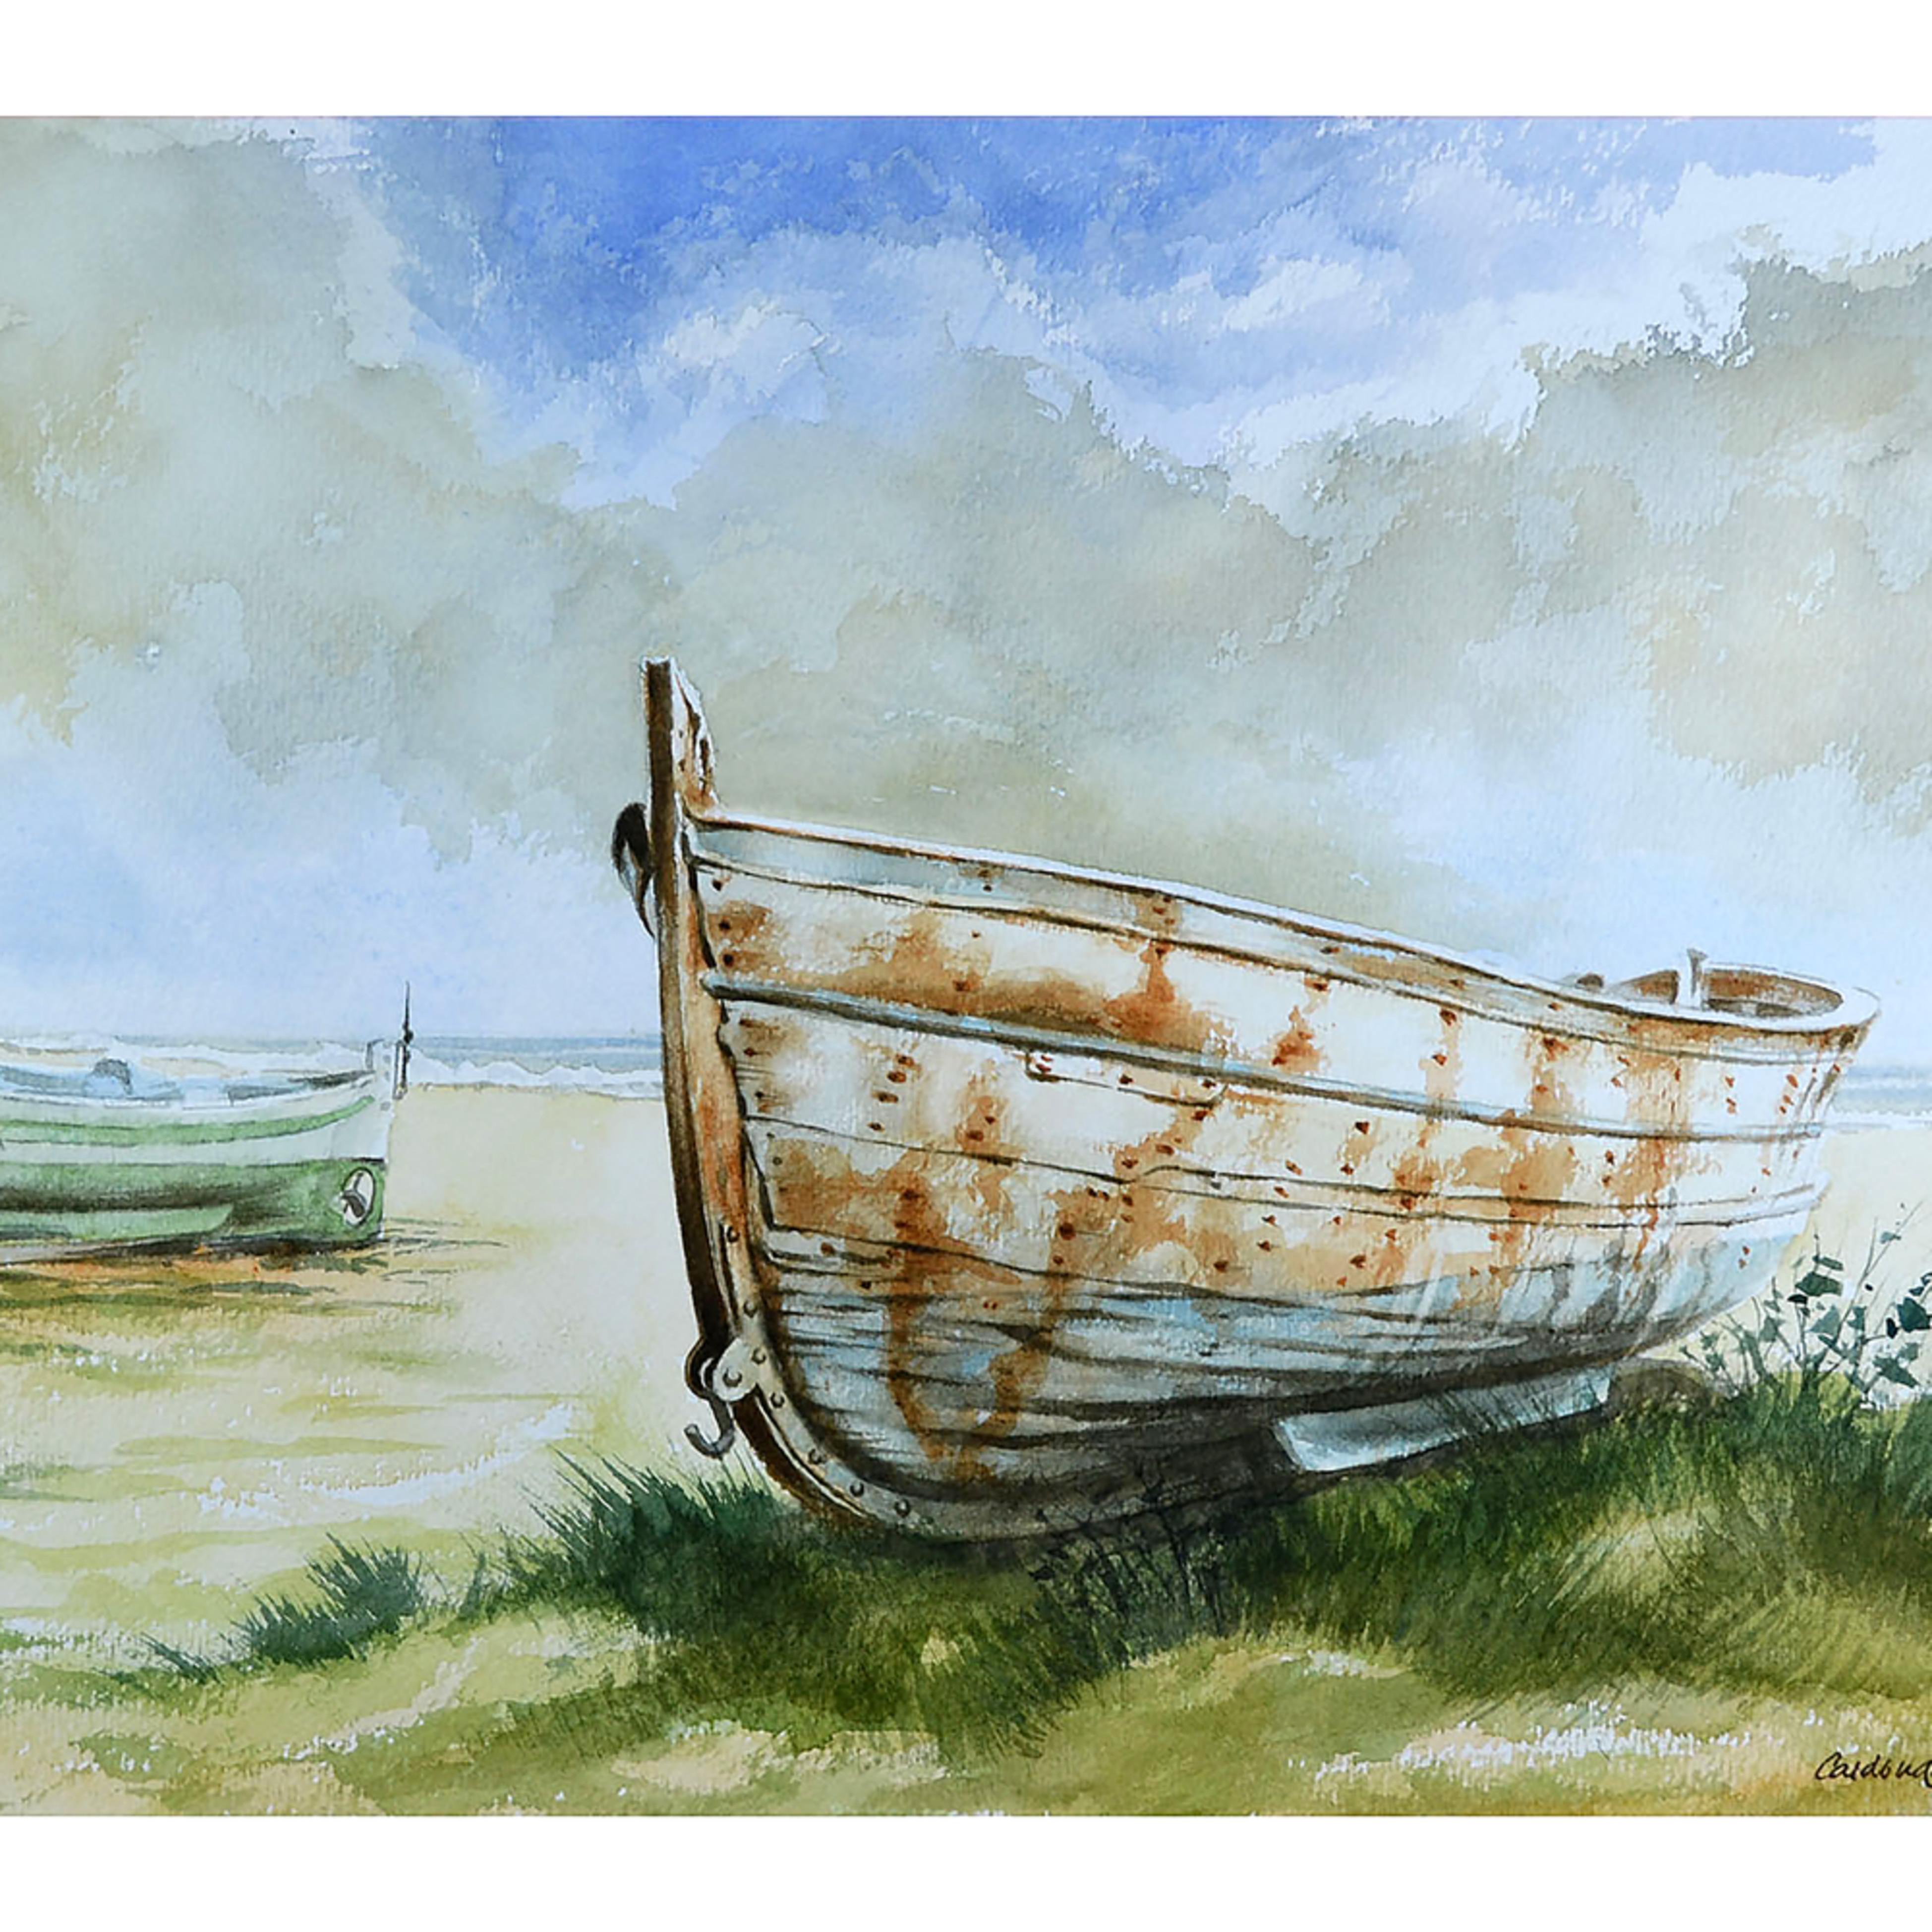 Abandoned.row.boat n8zasm